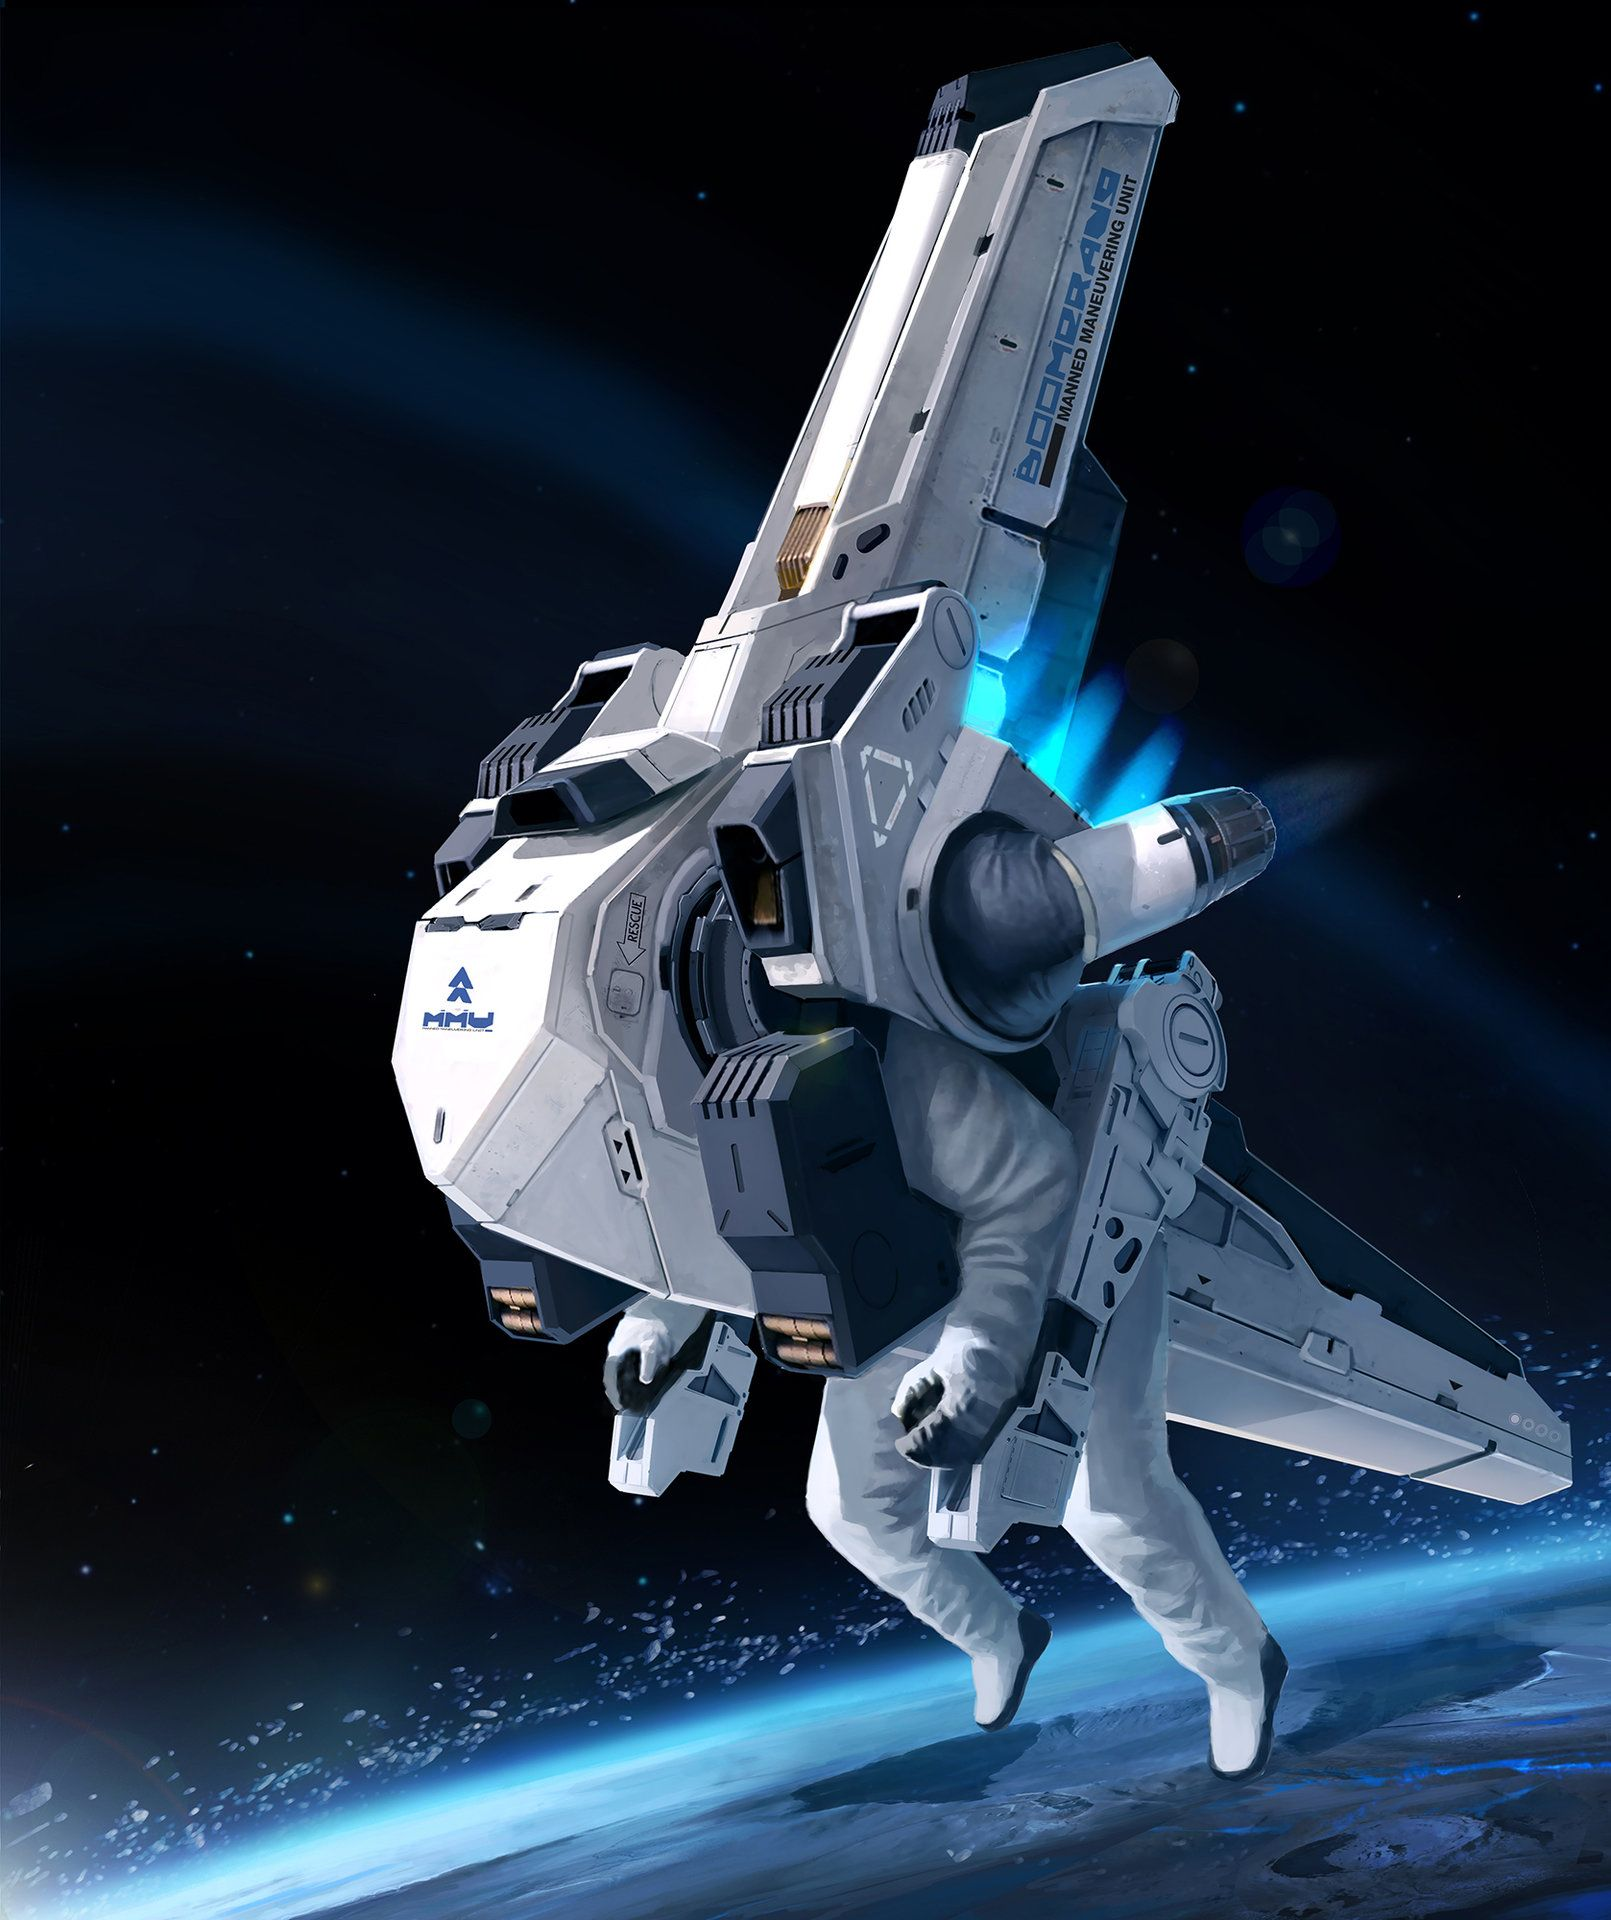 Artstation Boomerang Mmu Bruno Gauthier Leblanc Spaceship